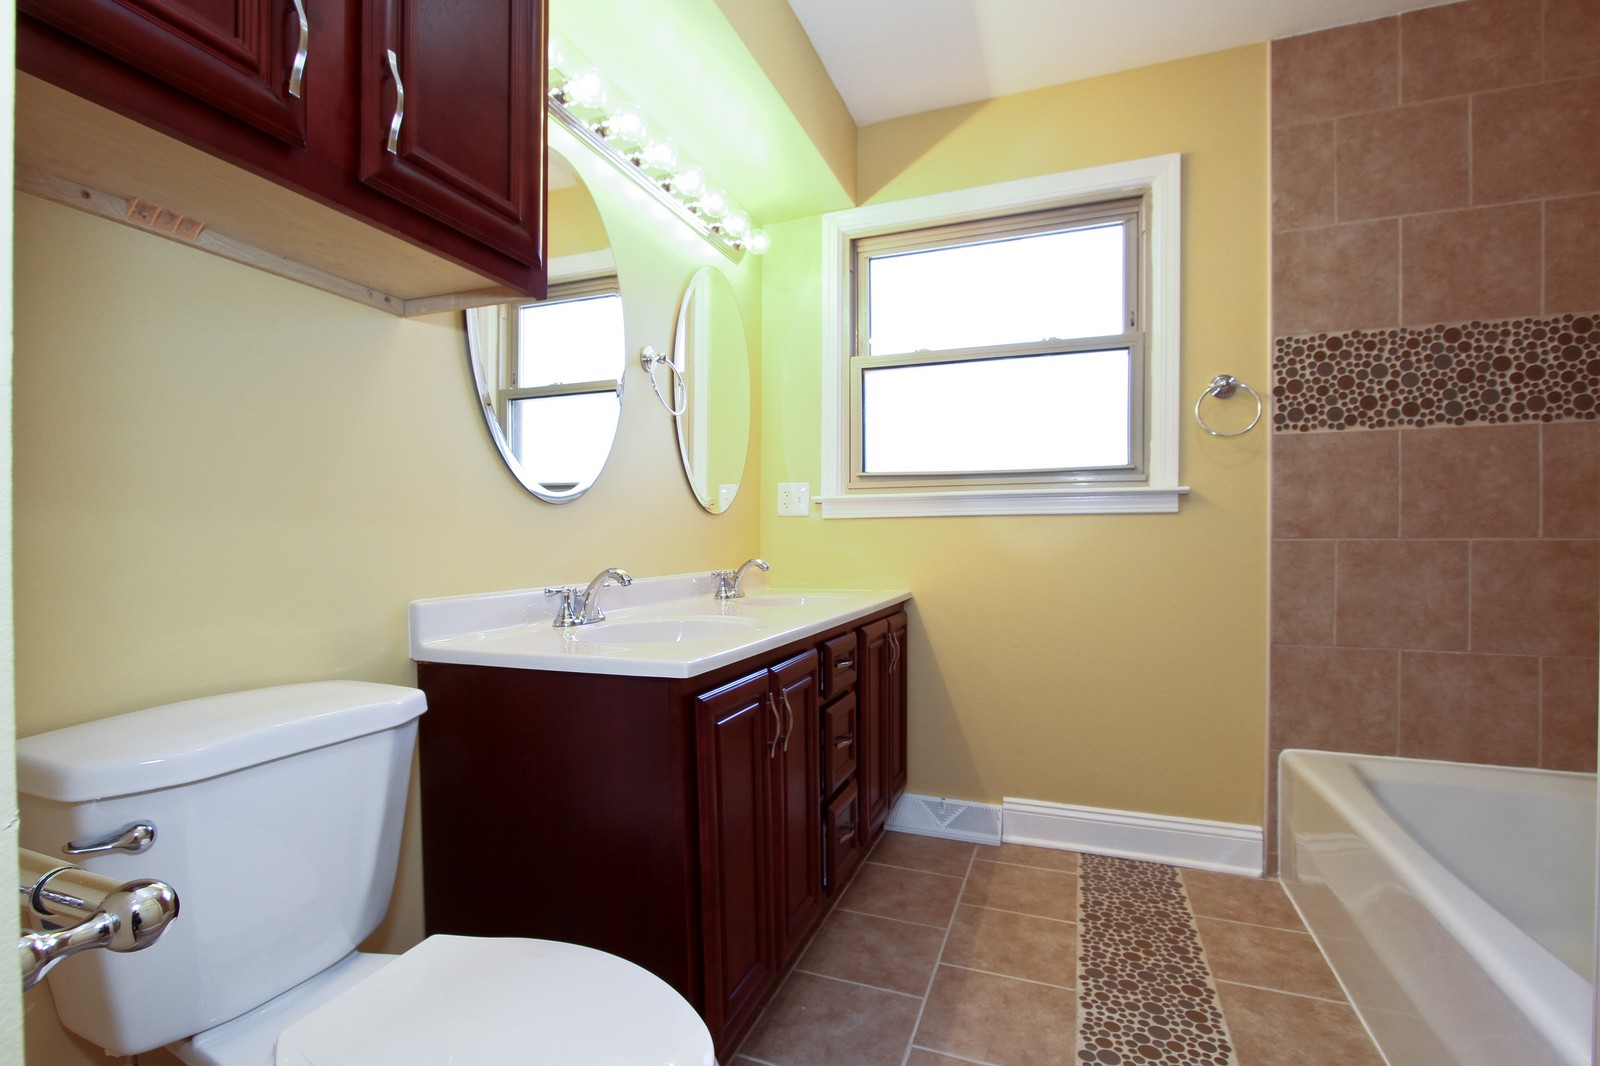 Real Estate Photography - 15435 Sunset, Dolton, IL, 60419 - Master Bathroom